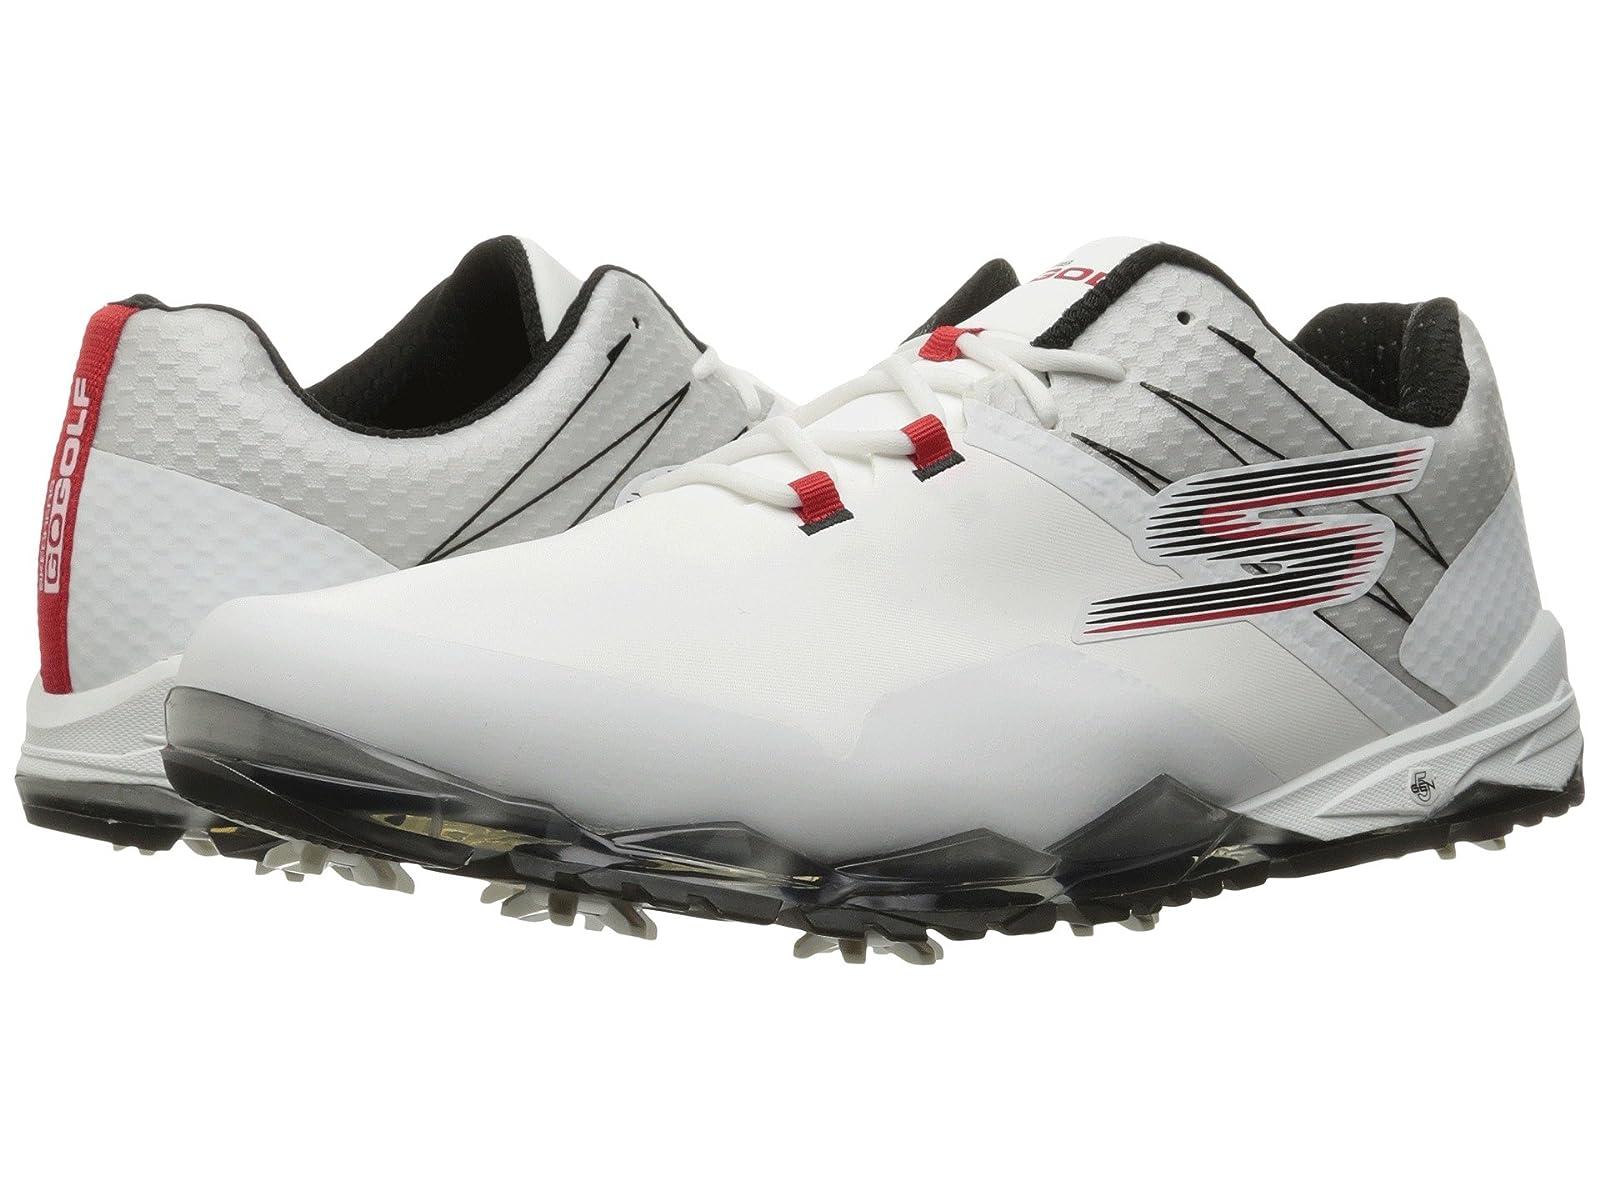 SKECHERS Go Golf FocusCheap and distinctive eye-catching shoes